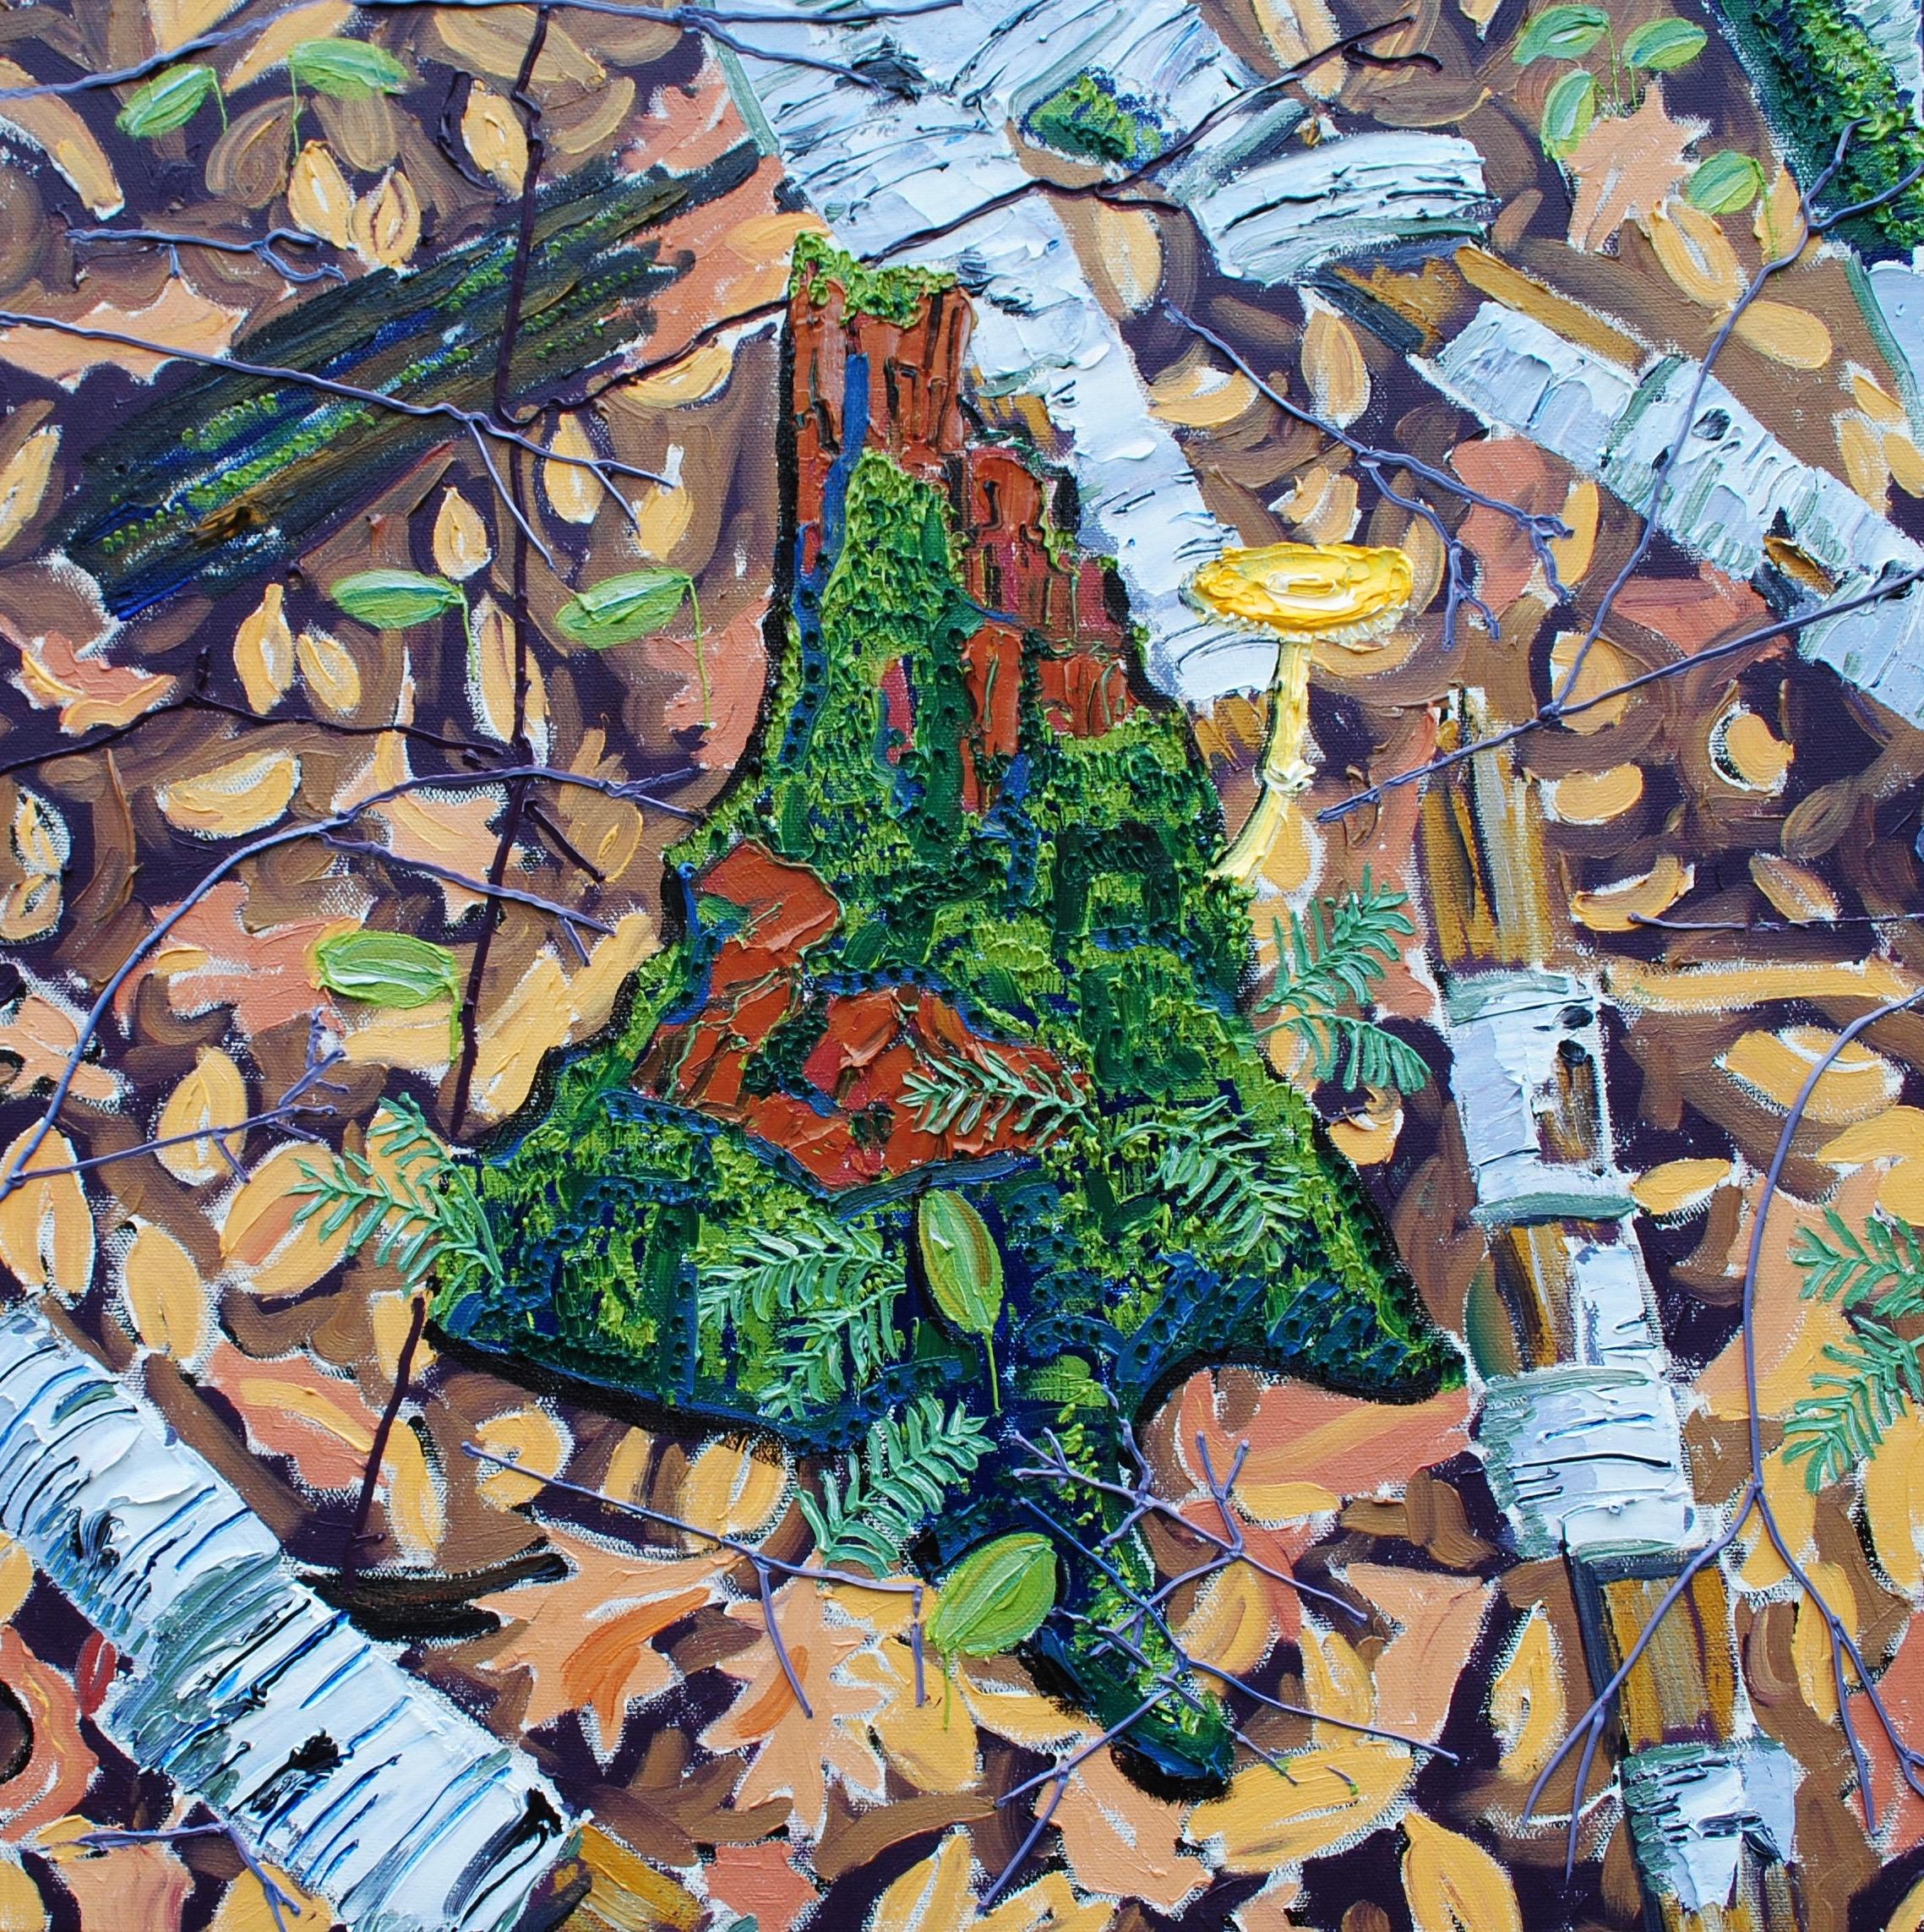 Mossy Stump with Yellow Wax Cap Mushroom